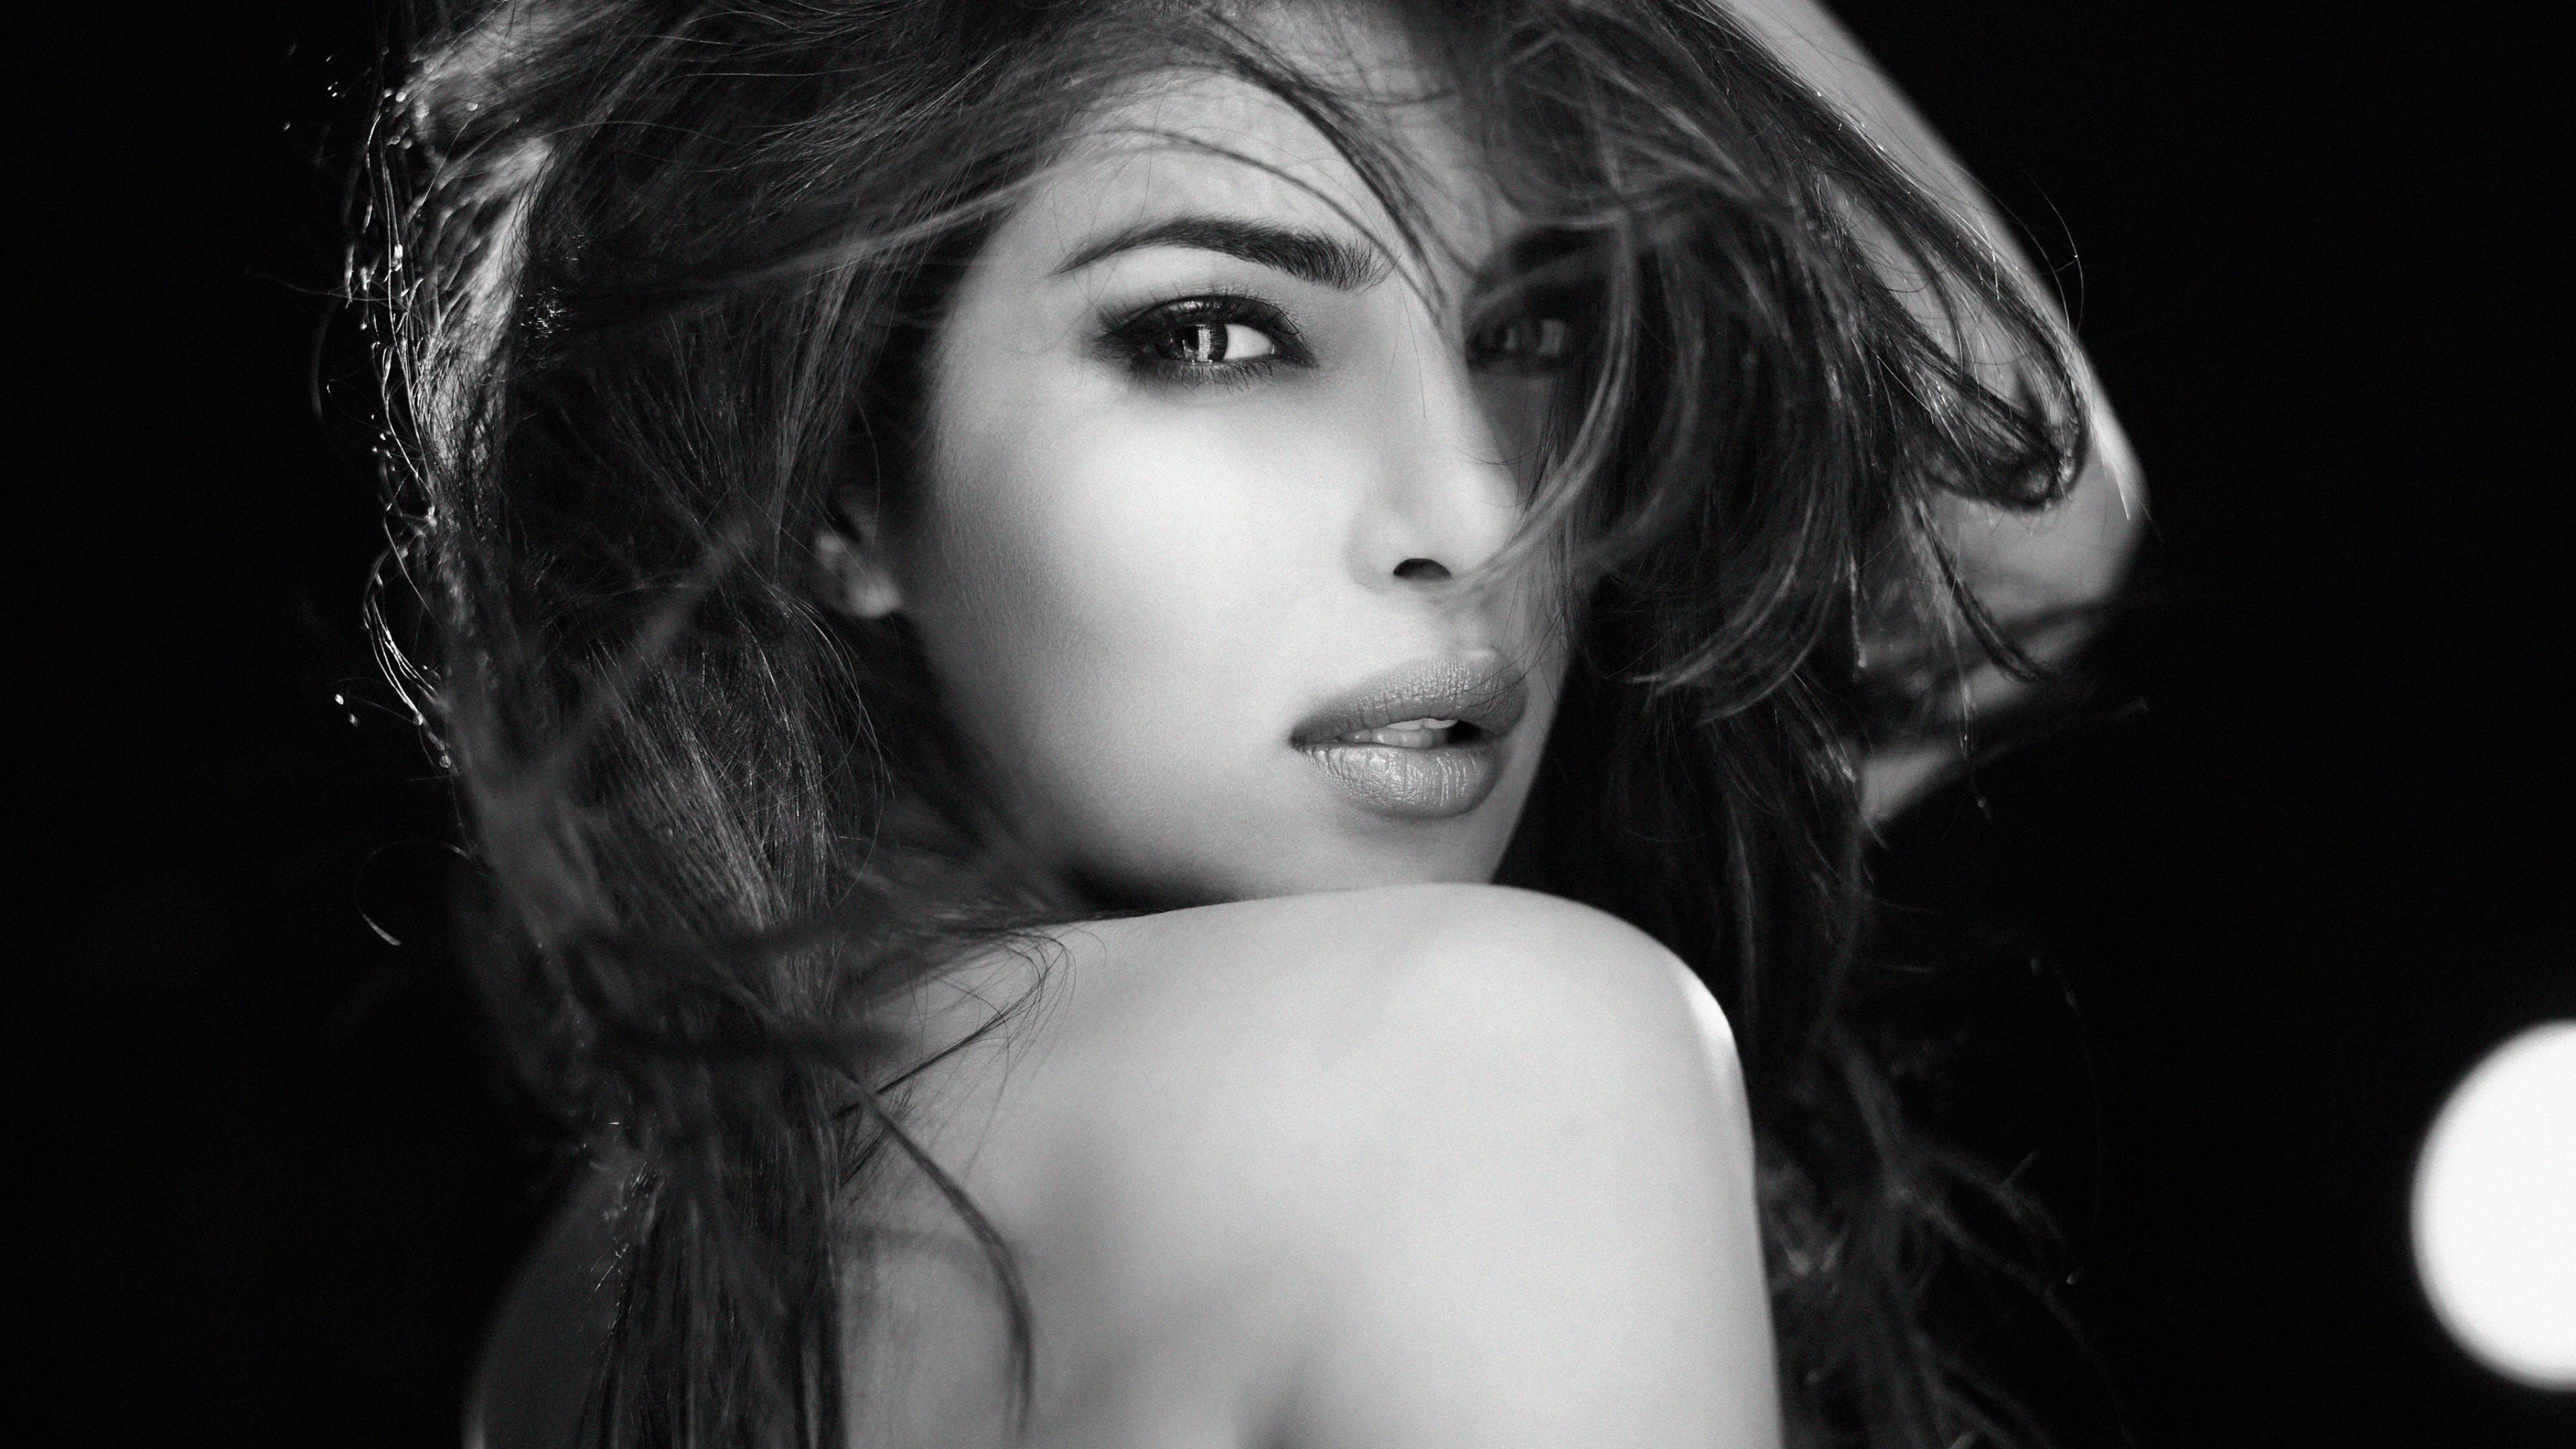 wallpaper priyanka chopra, beauty, bollywood, 4k, celebrities #15170